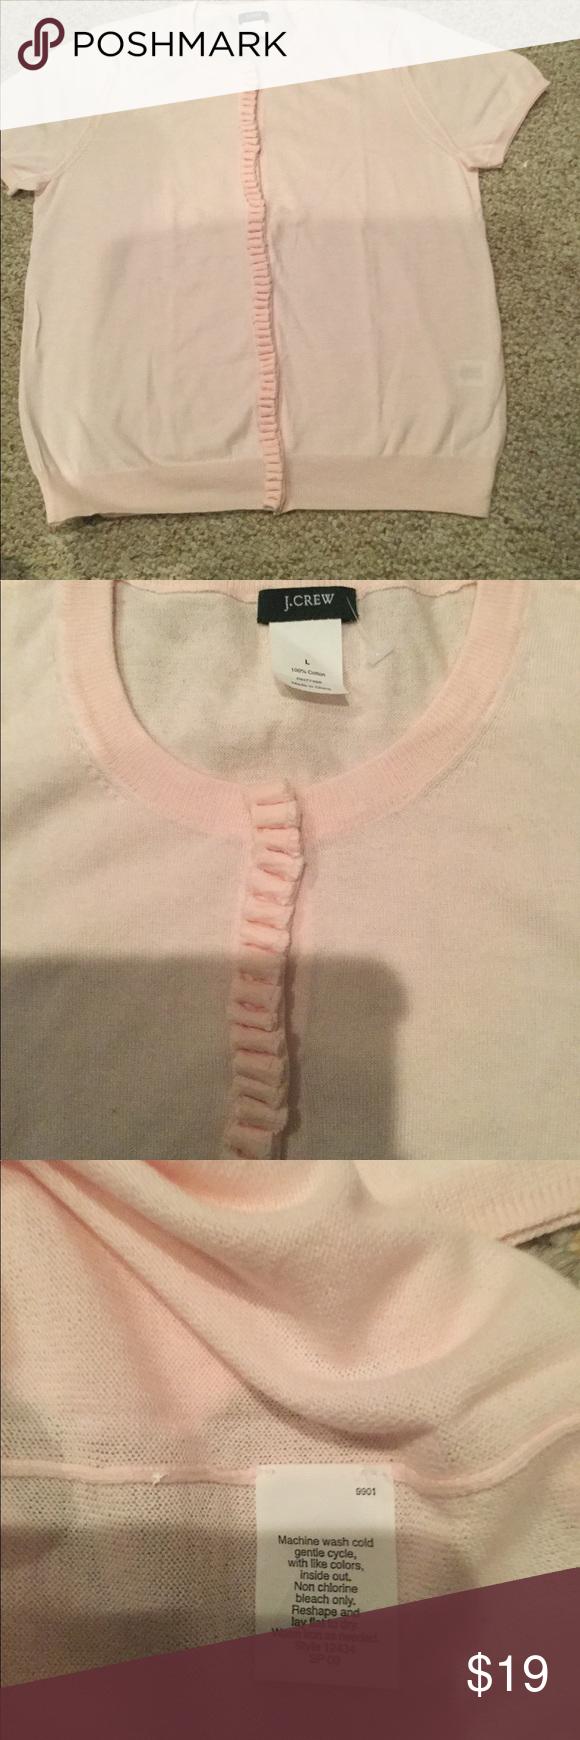 J Crew Light Pink Cotton Sweater Nwot Size Cotton Sweater Pink Cotton Light Weight Sweater